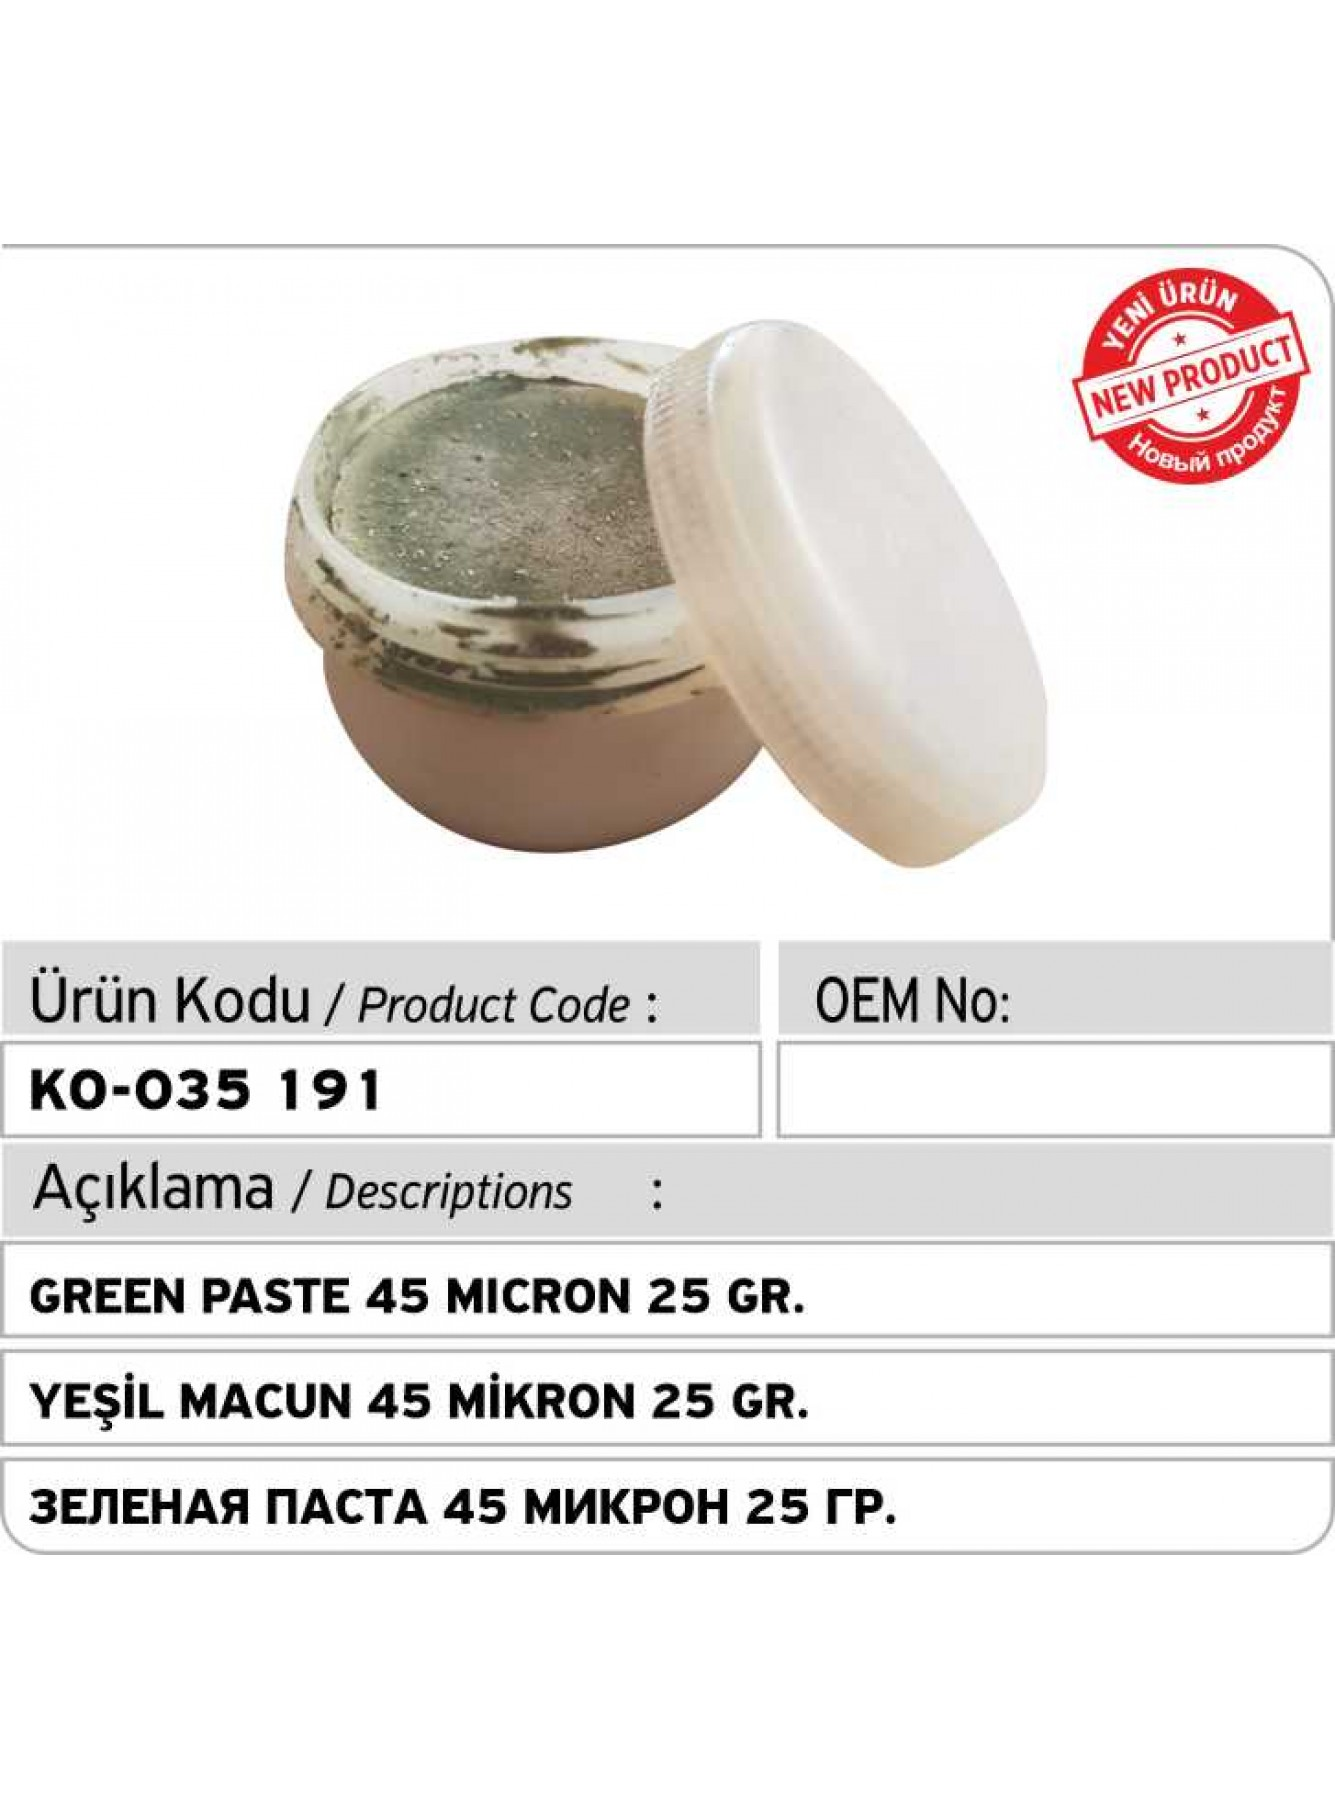 Зеленная паста 45 Микрон 25 гр.